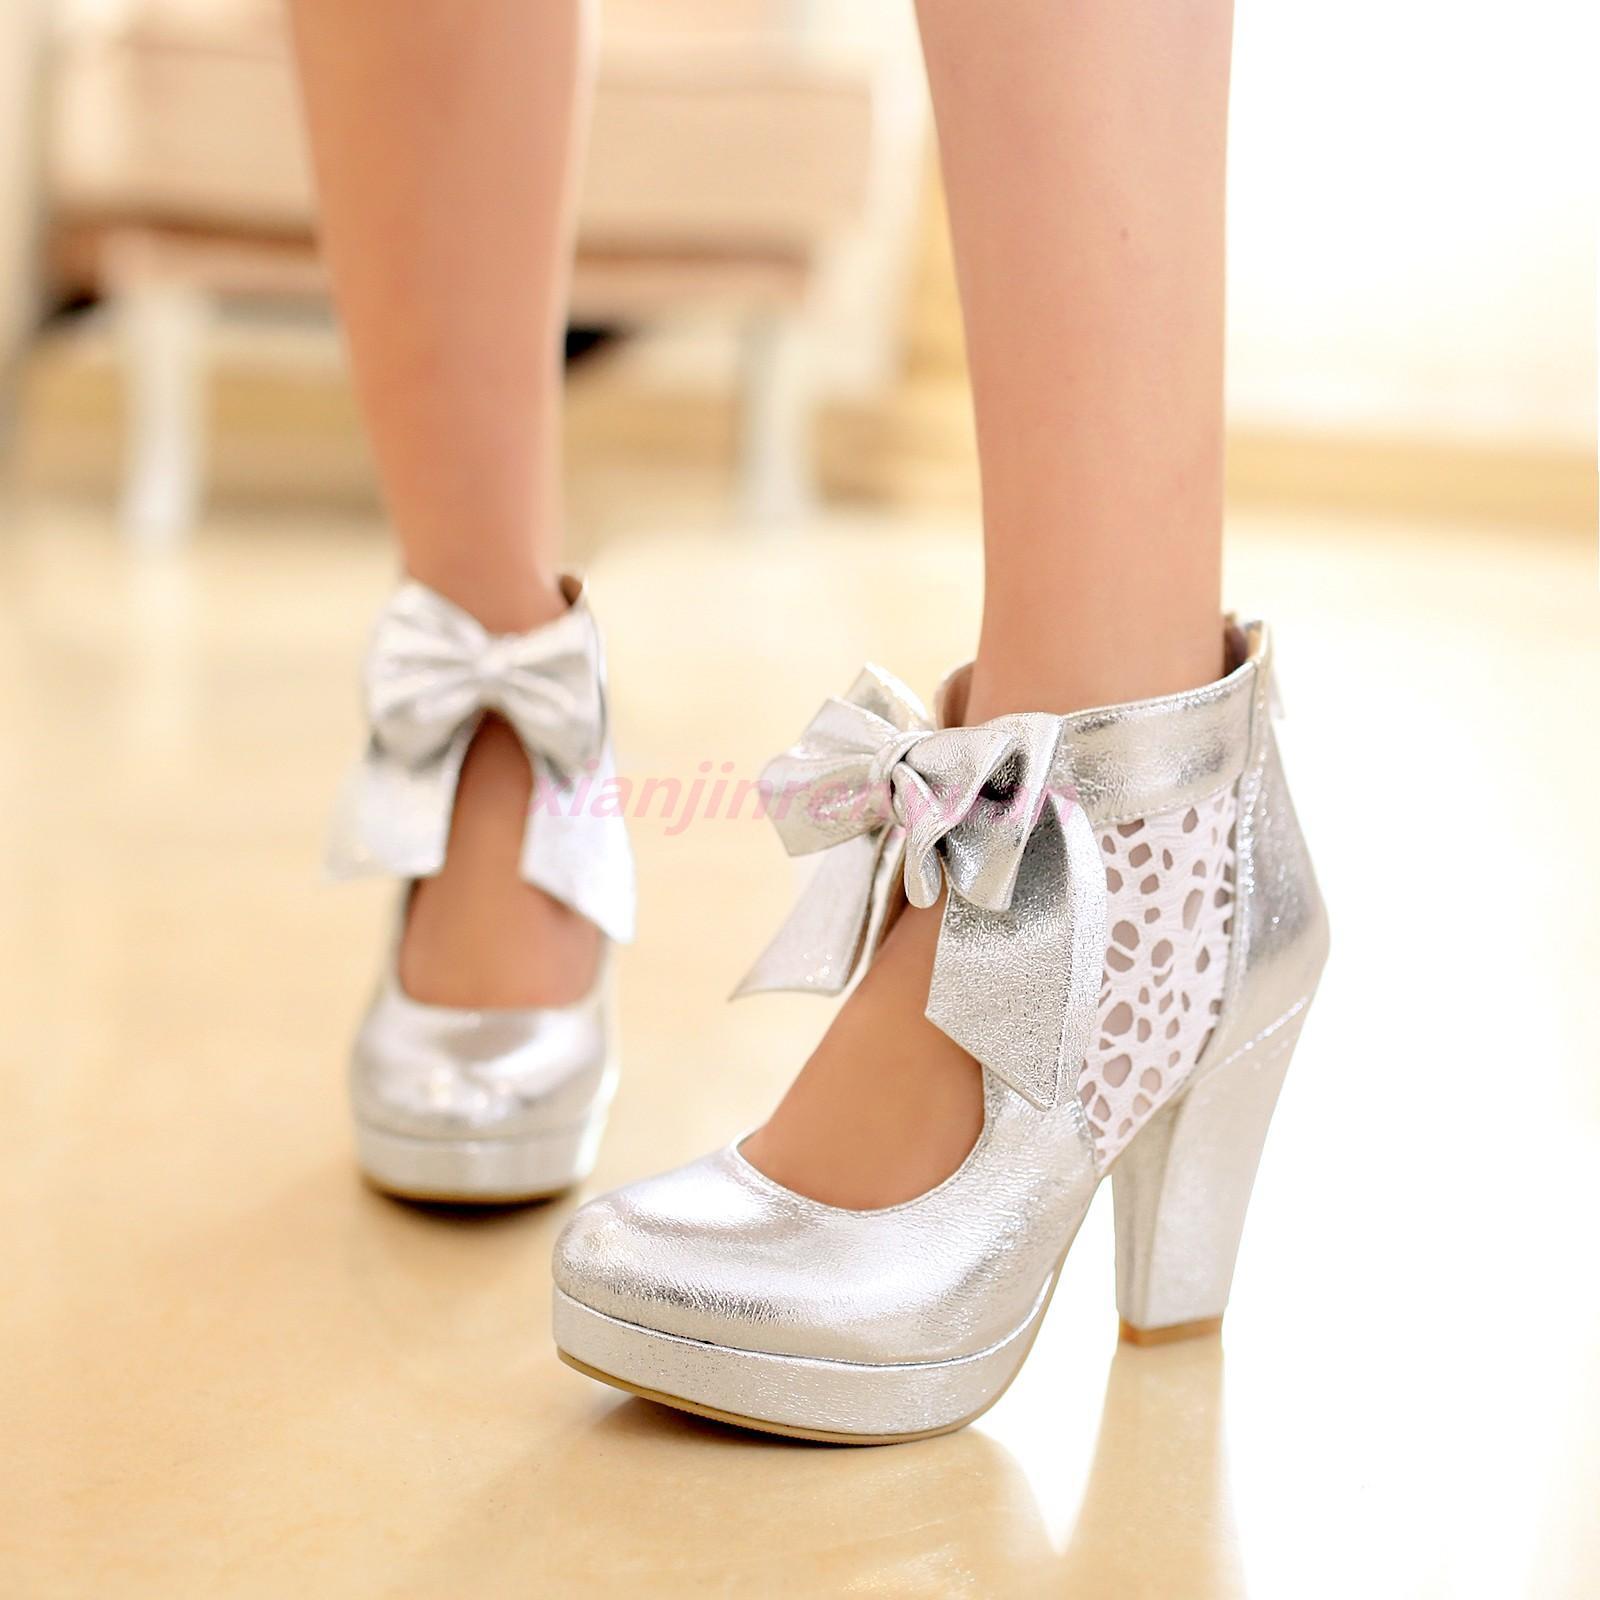 Chic Lolita Womens Dress Bowknot Platform Platform Bowknot Vintage Court High Heels Block Shoes 032de2